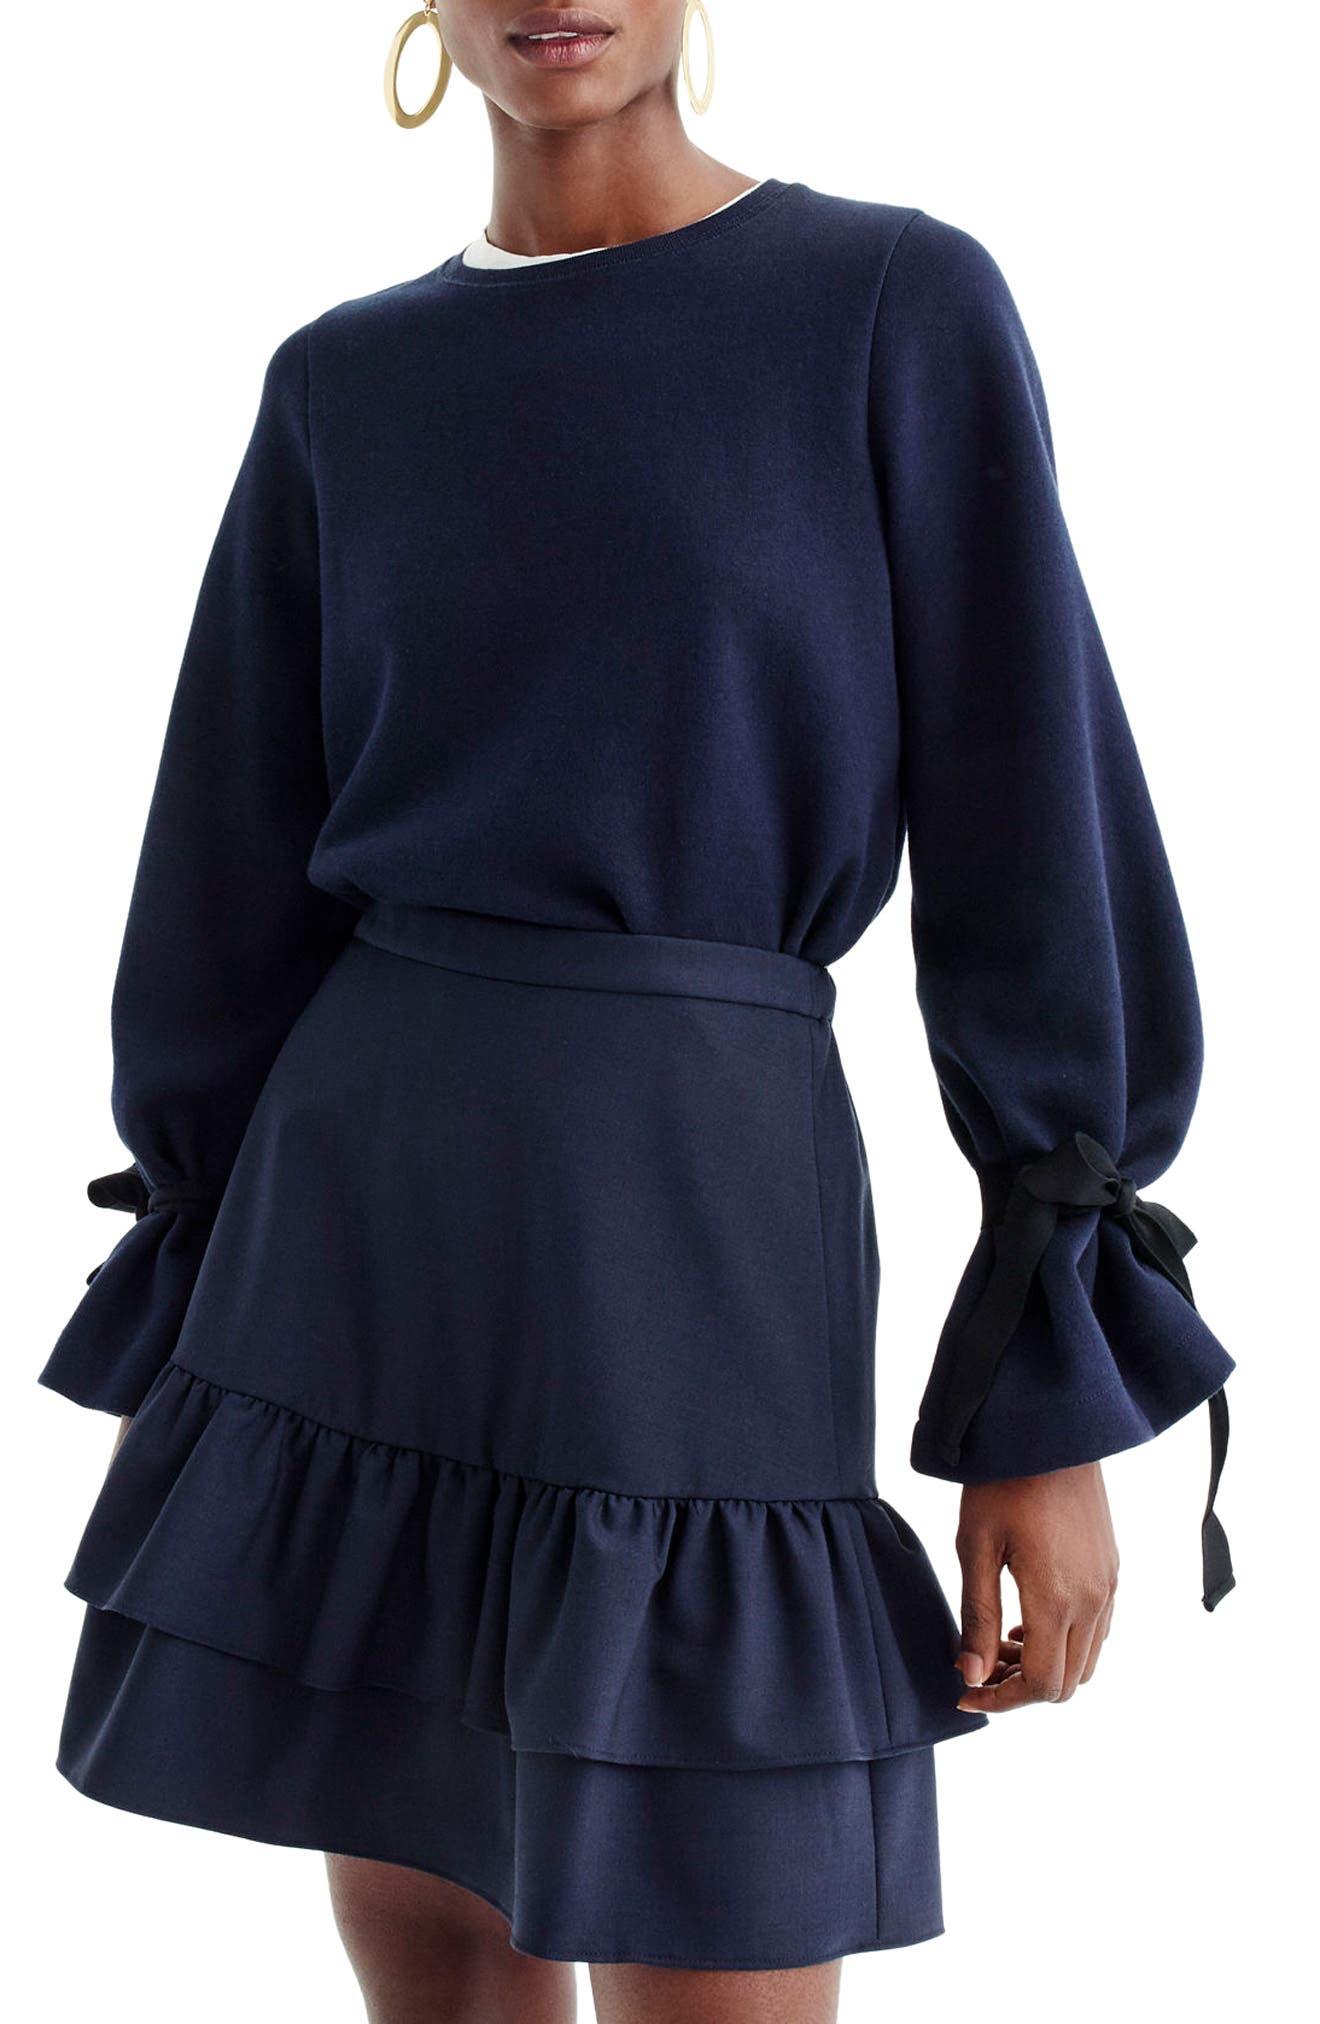 Main Image - J.Crew Tie Sleeve Sweatshirt